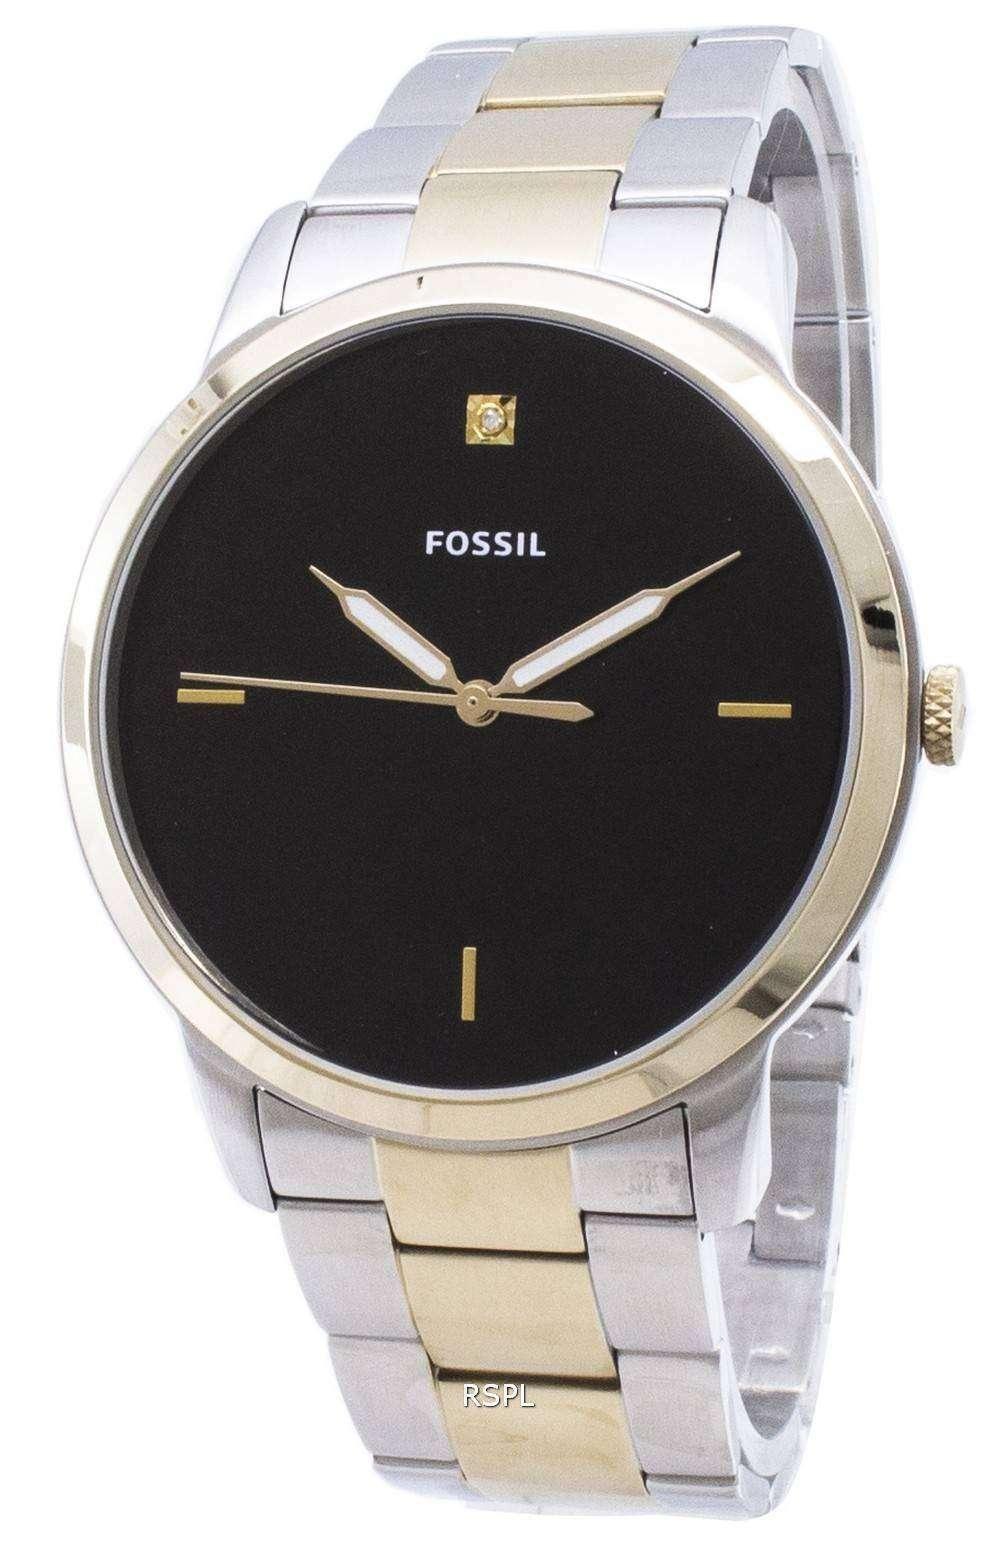 c09be093ed28 Fossil Minimalist FS5458 Quartz Analog Men s Watch - ZetaWatches